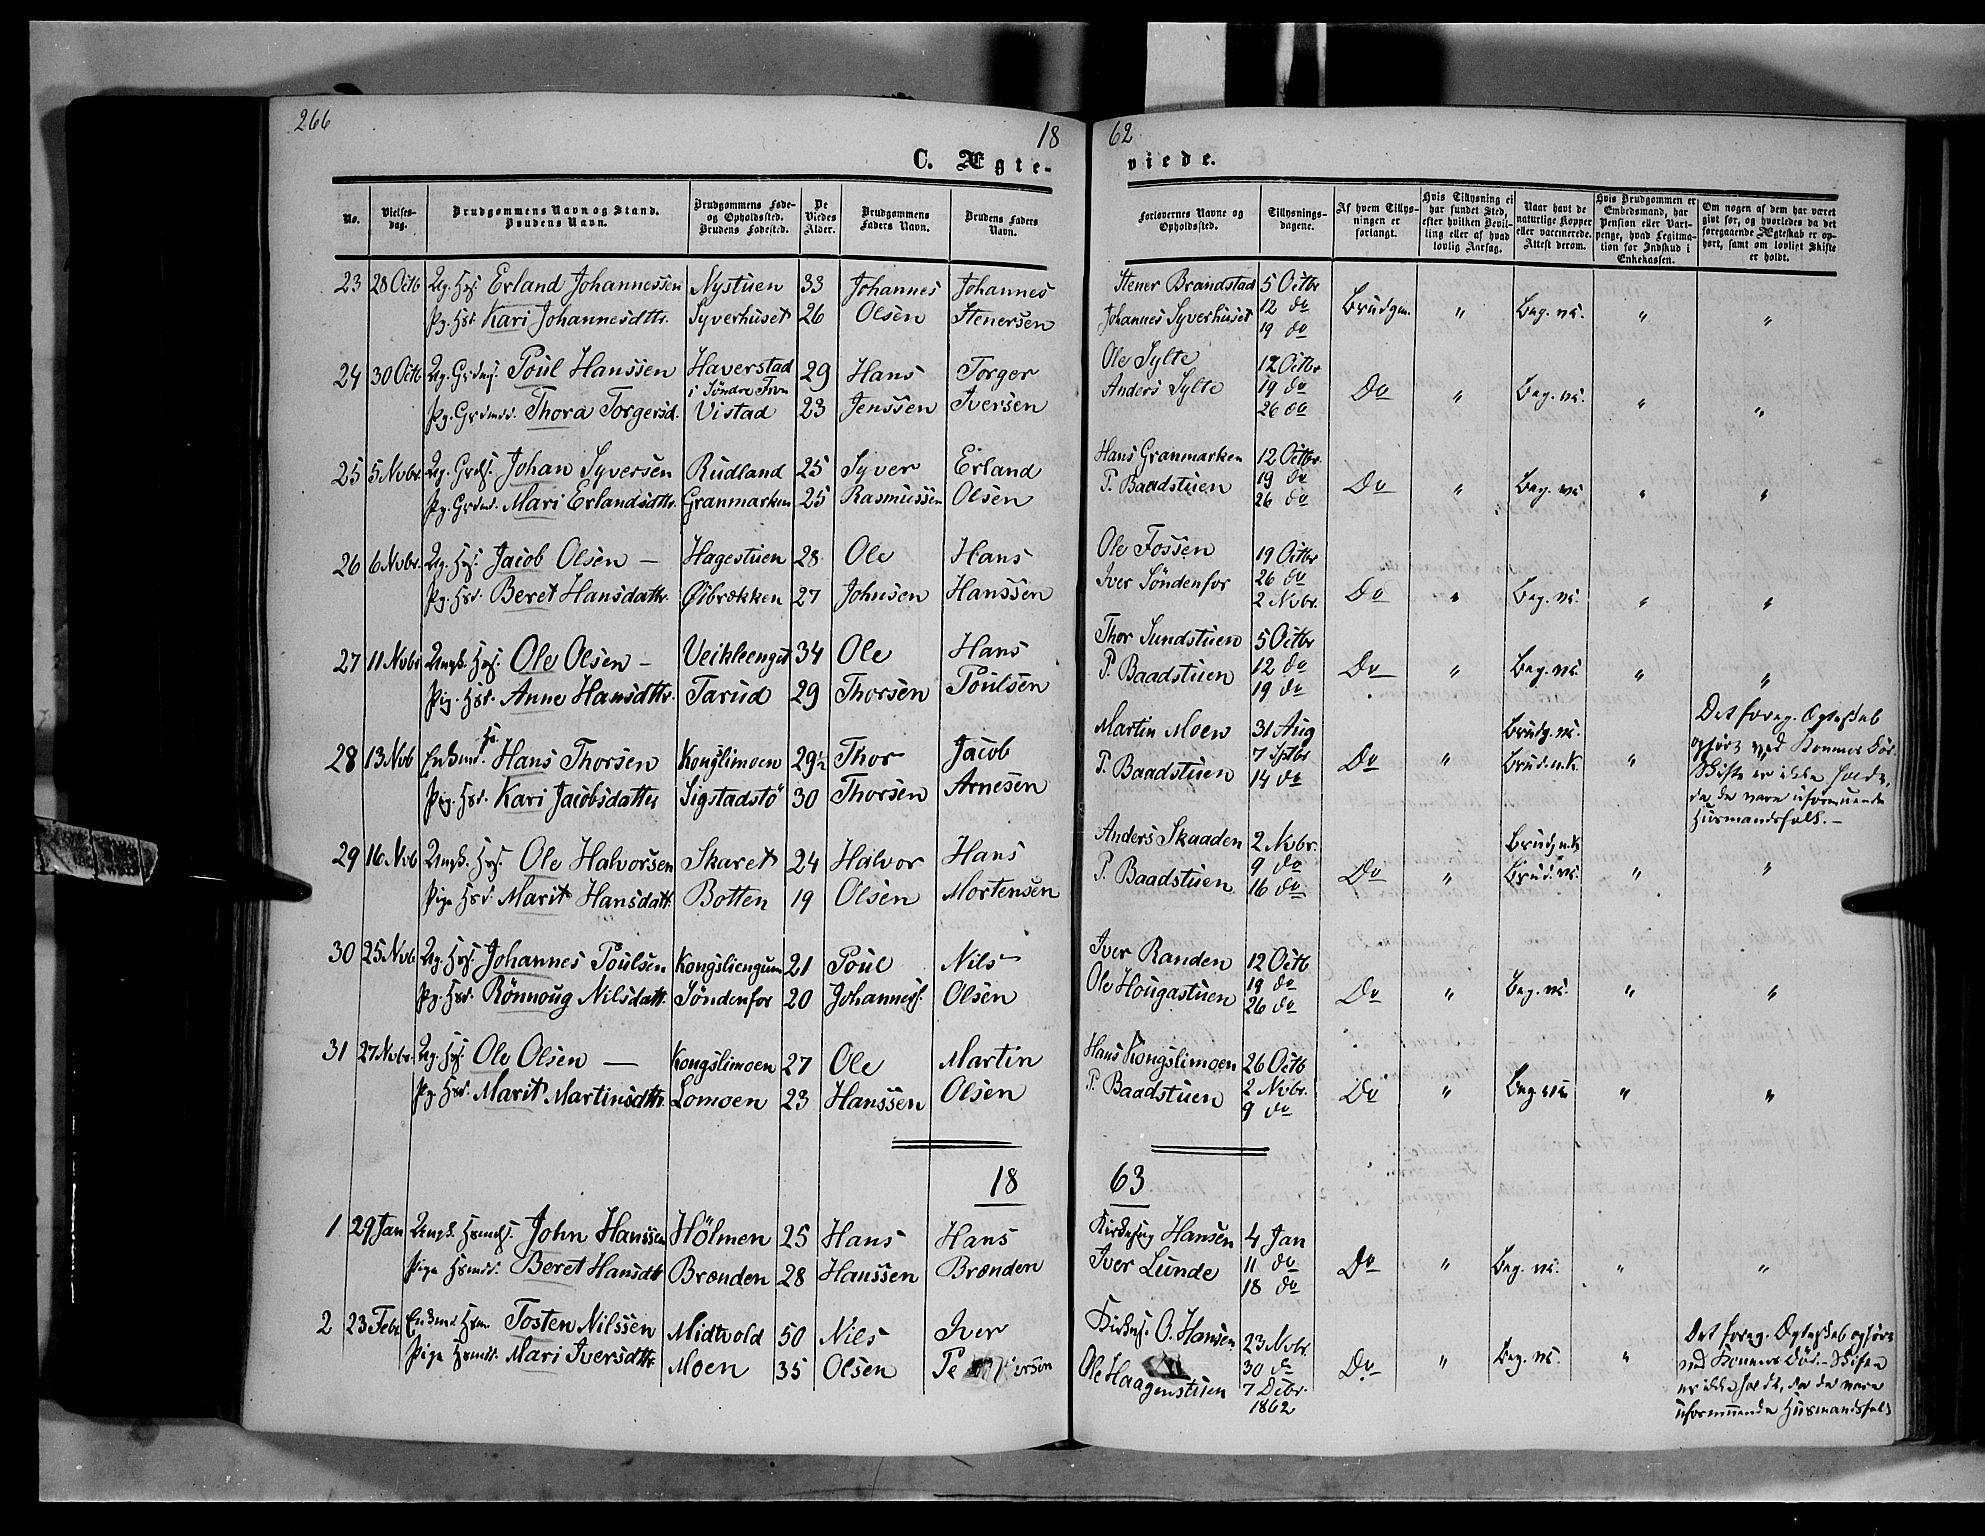 SAH, Nord-Fron prestekontor, Ministerialbok nr. 1, 1851-1864, s. 266